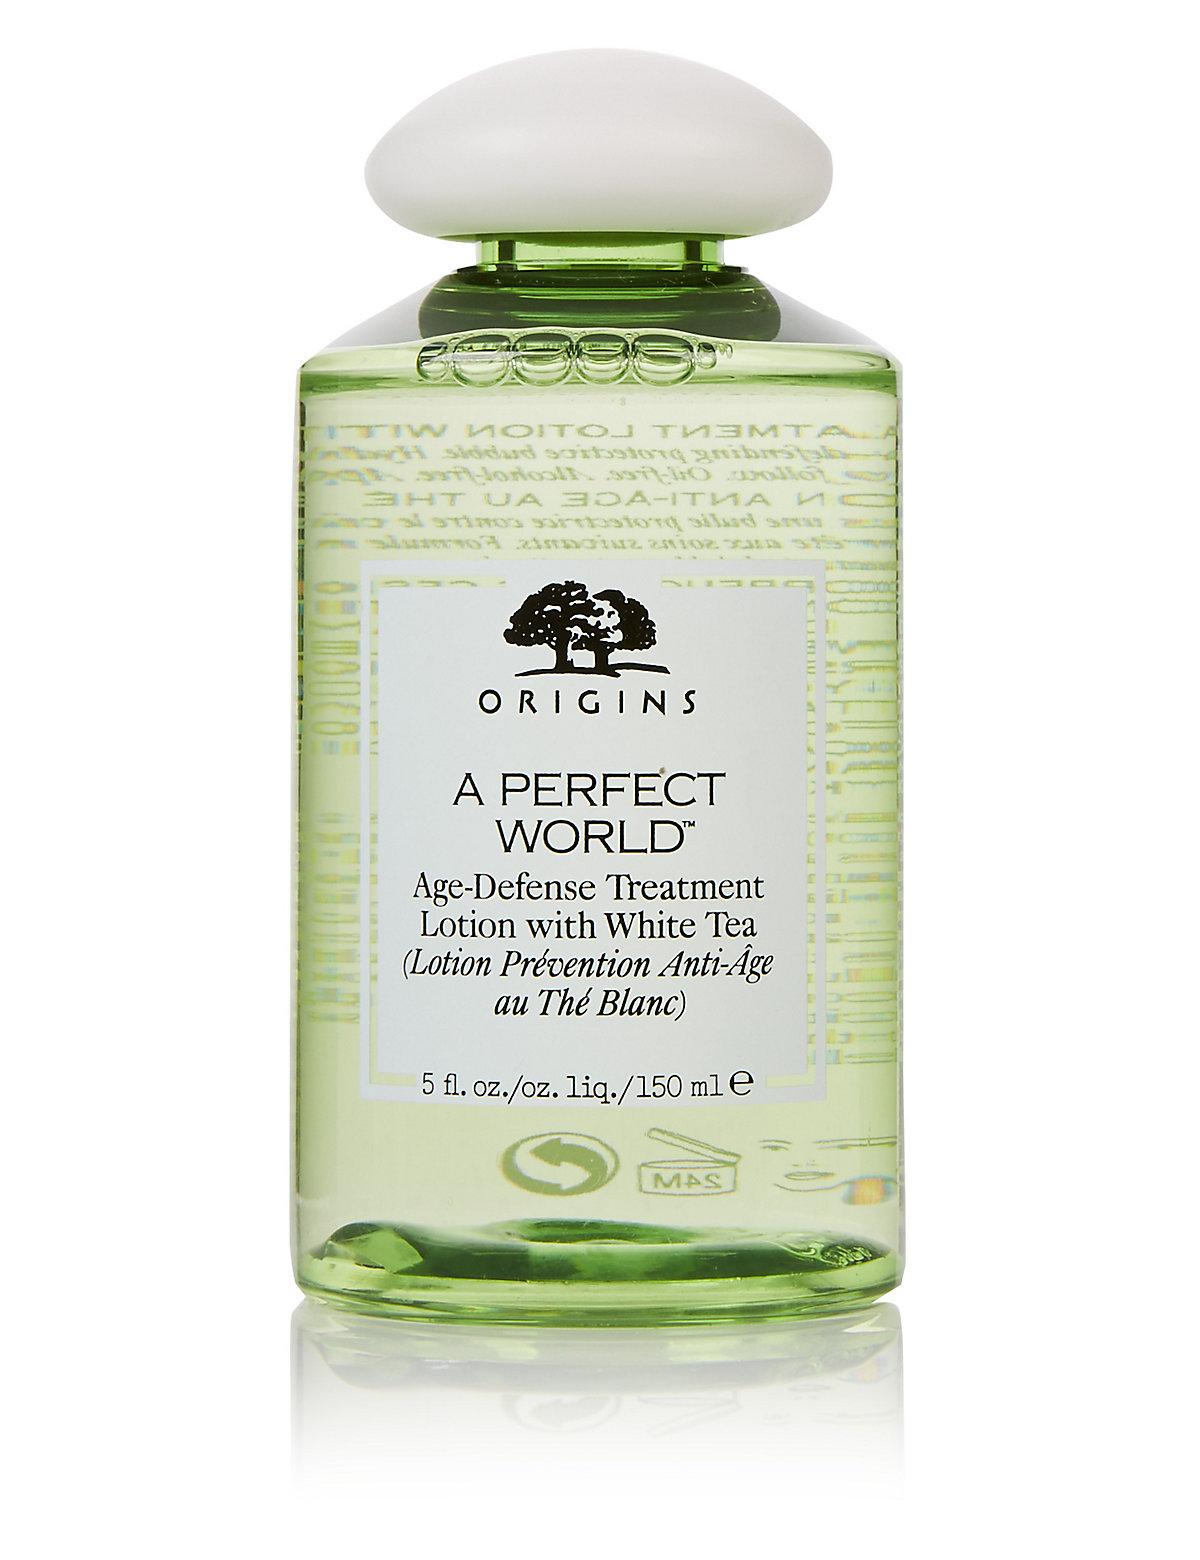 Origins A Perfect World Age-Defense Treatment Lotion with White Tea 150ml